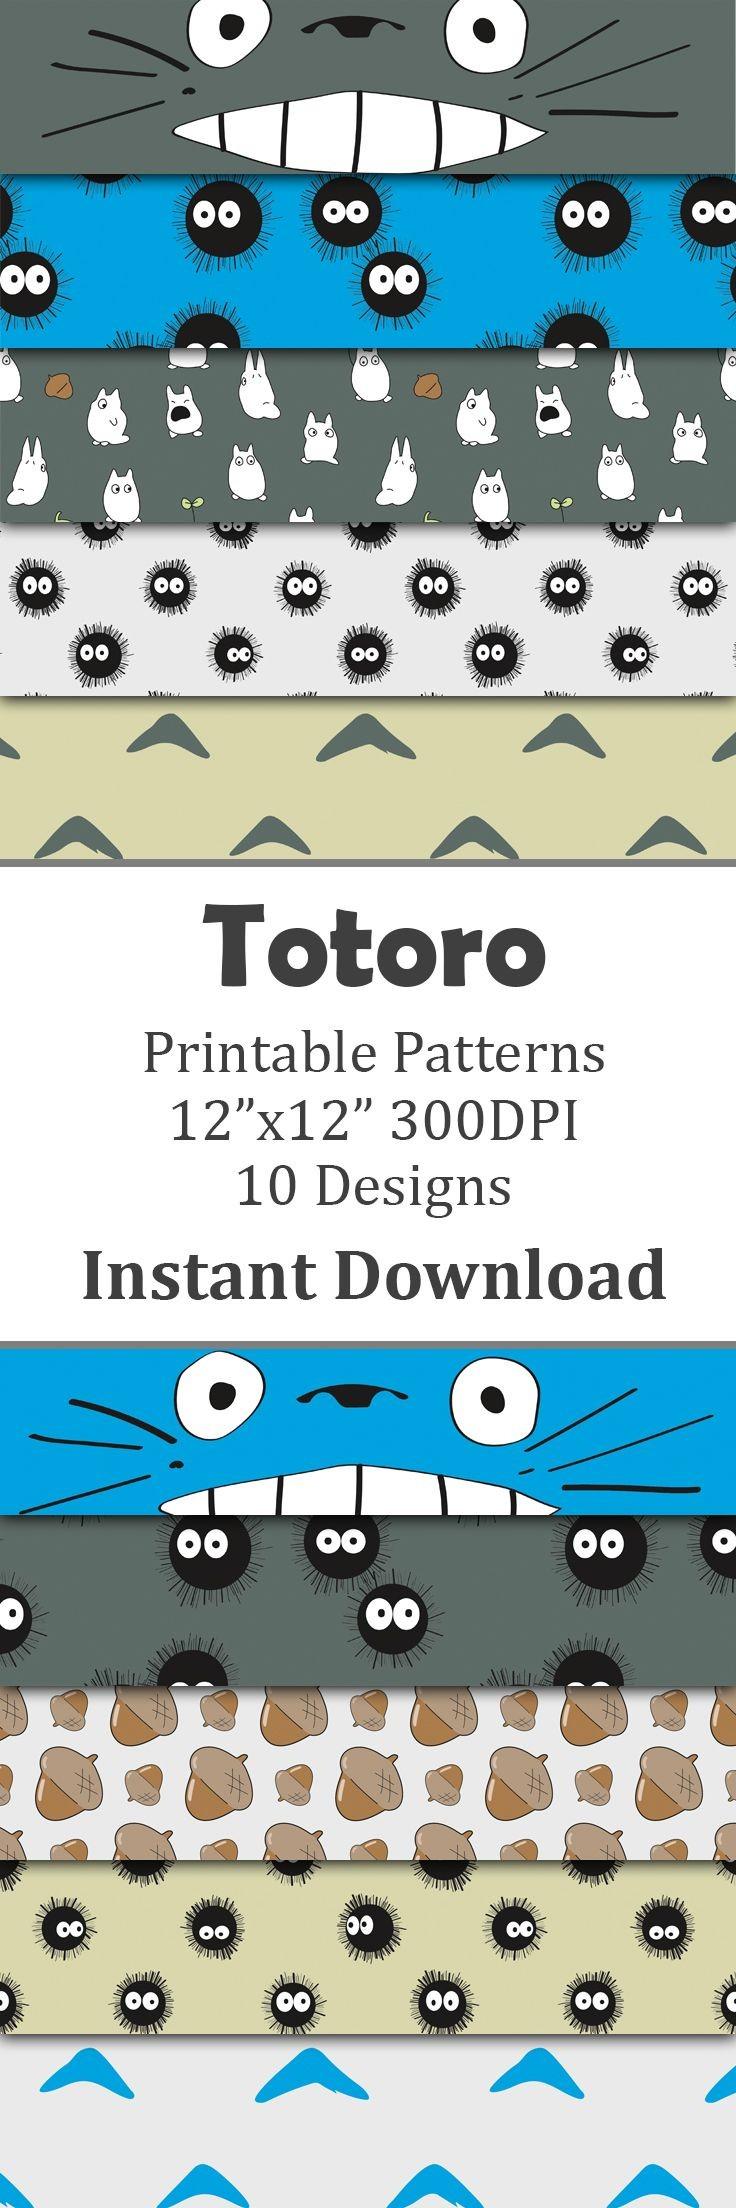 Totoro Papercraft 33 Best Fiesta Cumple totoro Images On Pinterest